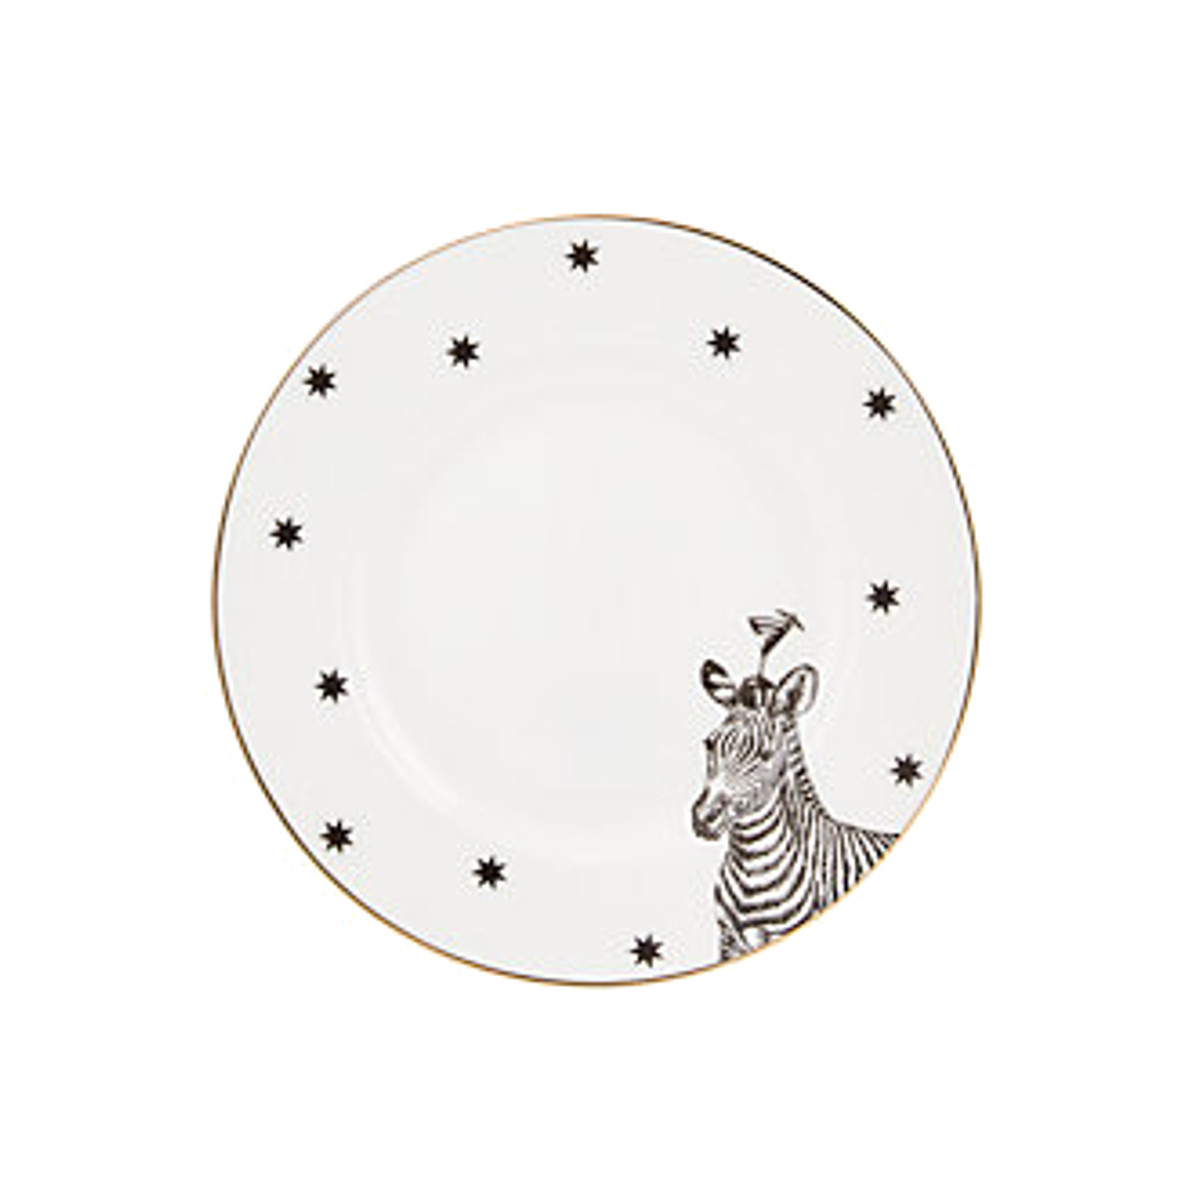 Yvonne Ellen London Monochrome Set of 2 Plates Ø 16 cm - Zebra - Bone China